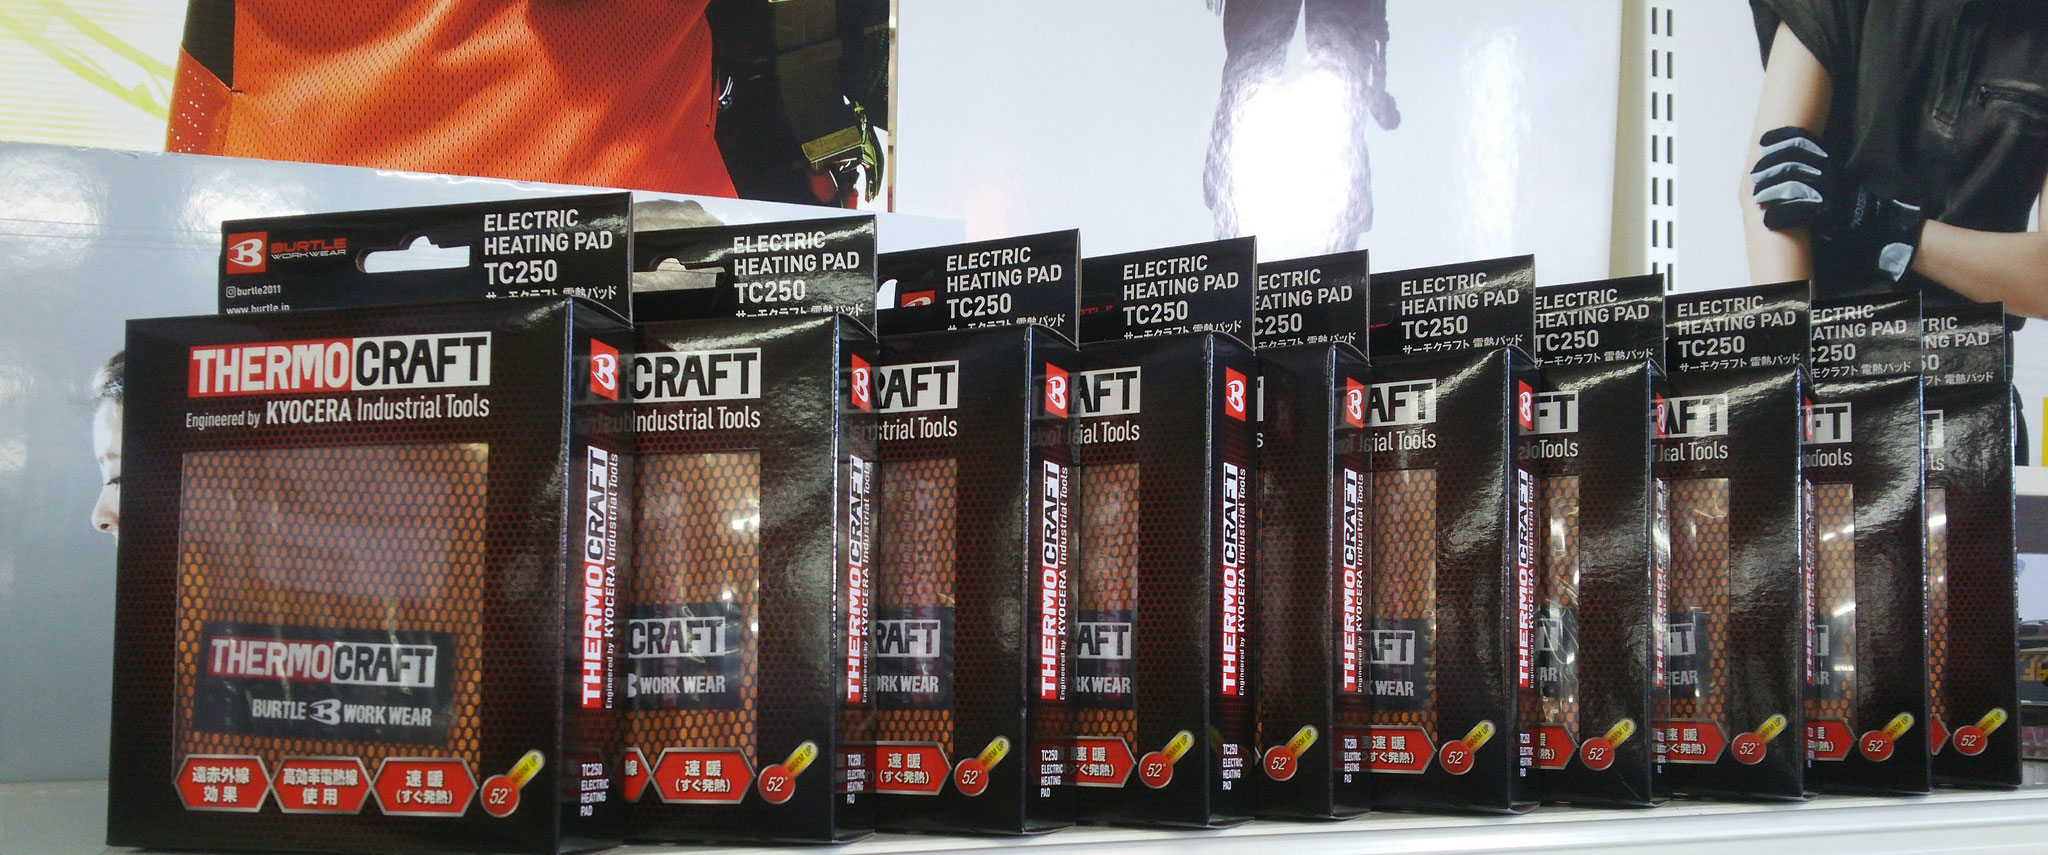 THERMO CRAFT~サーモクラフト~TC250 電熱パット¥4,950(税込)